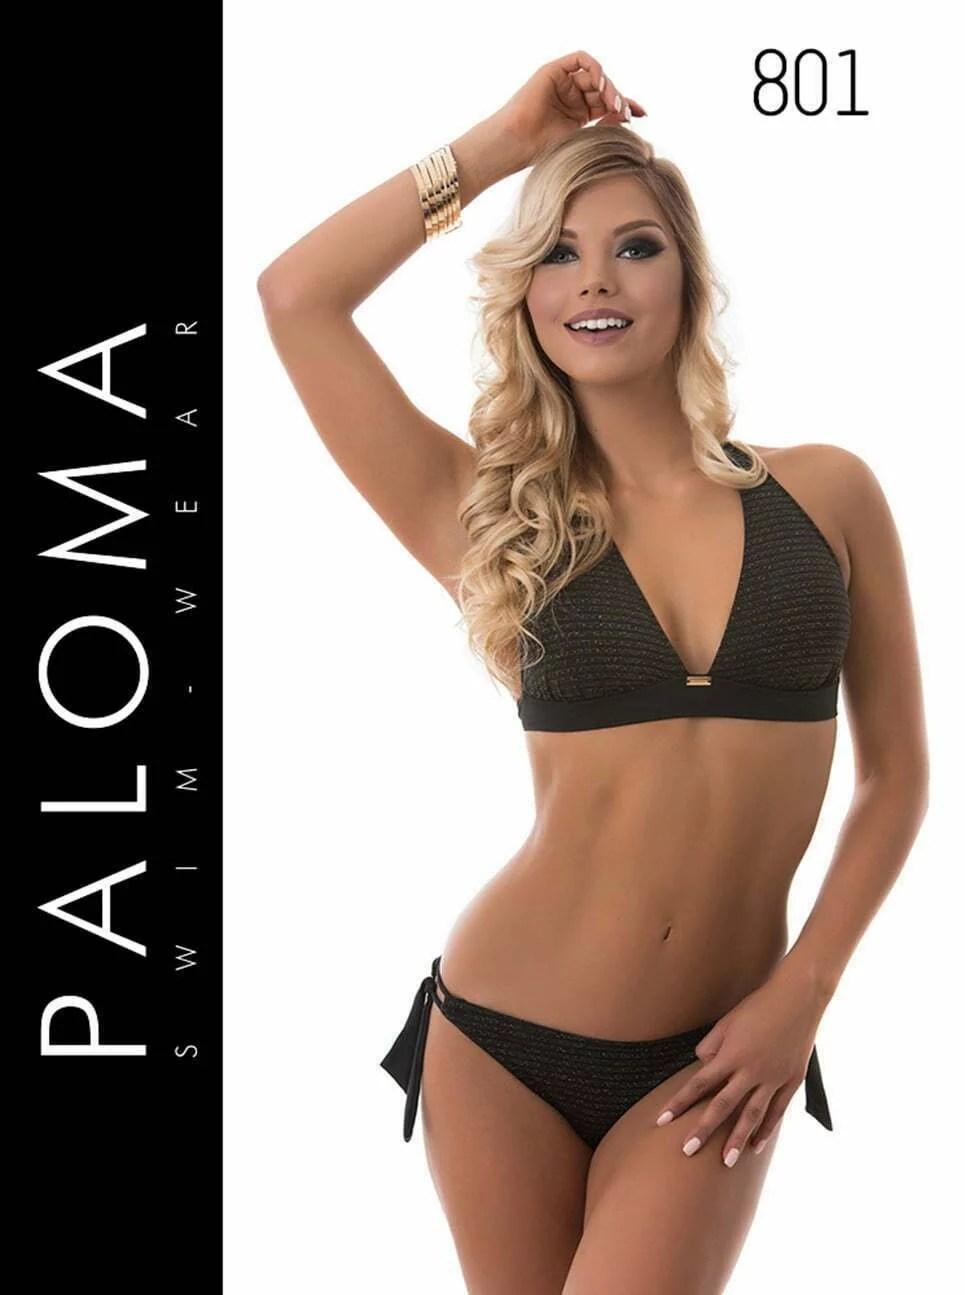 PALOMA lurex szálas bikini fürdőruha 801